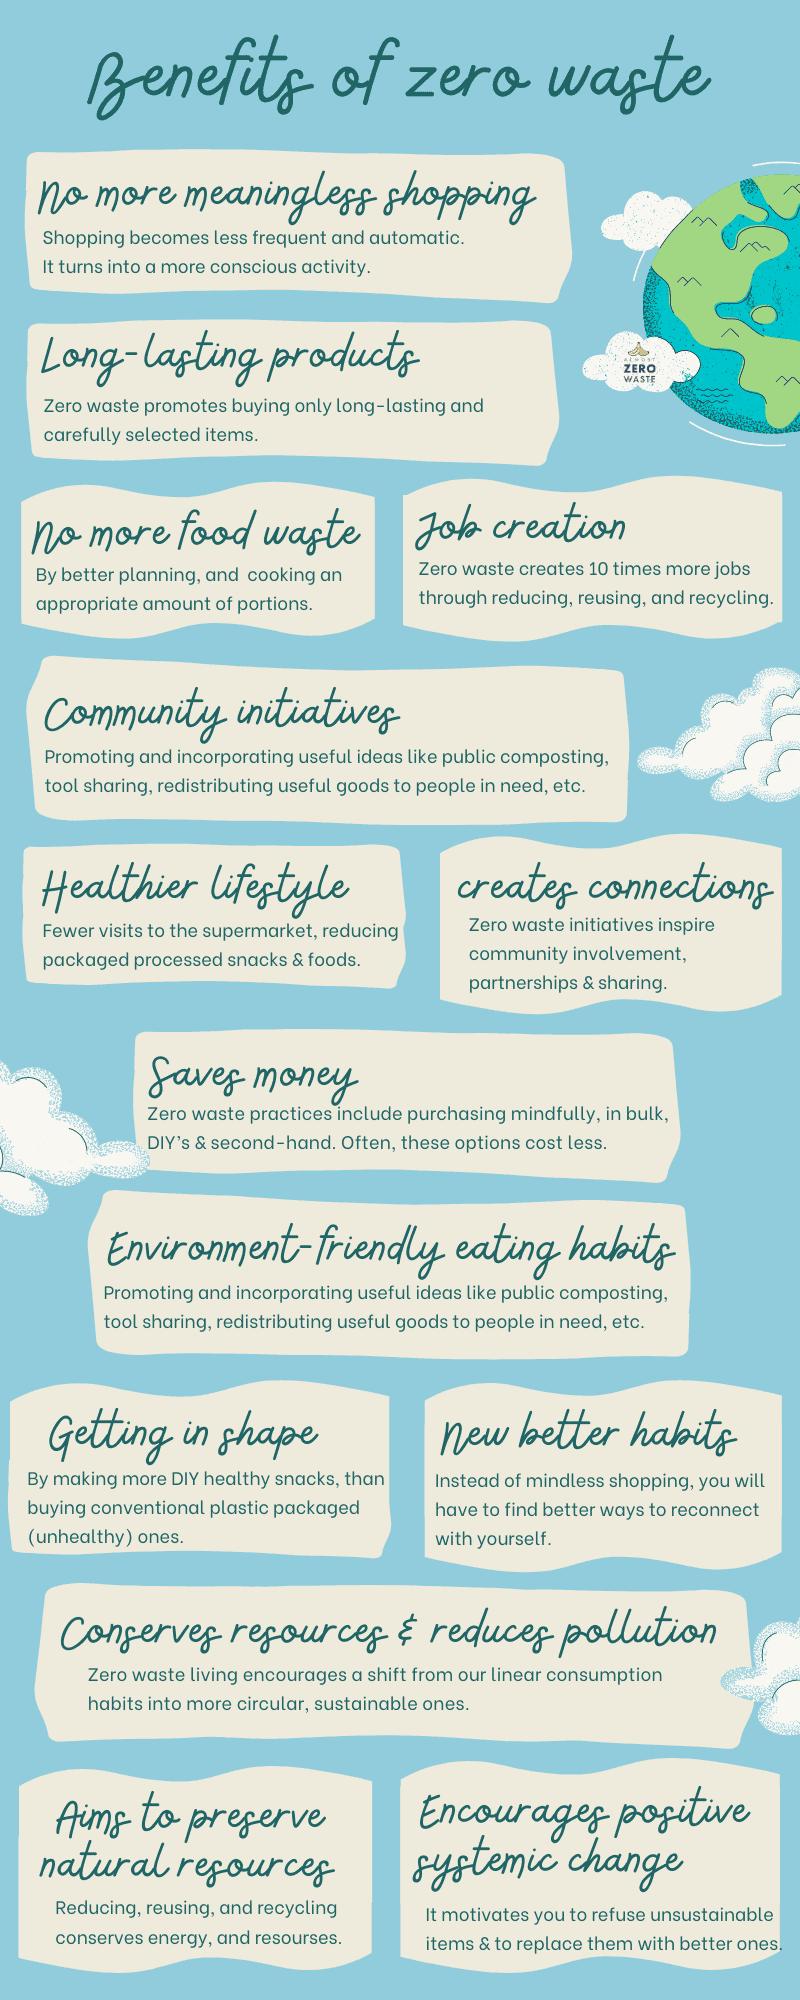 Zero Waste Benefits - Infographic - Almost Zero Waste